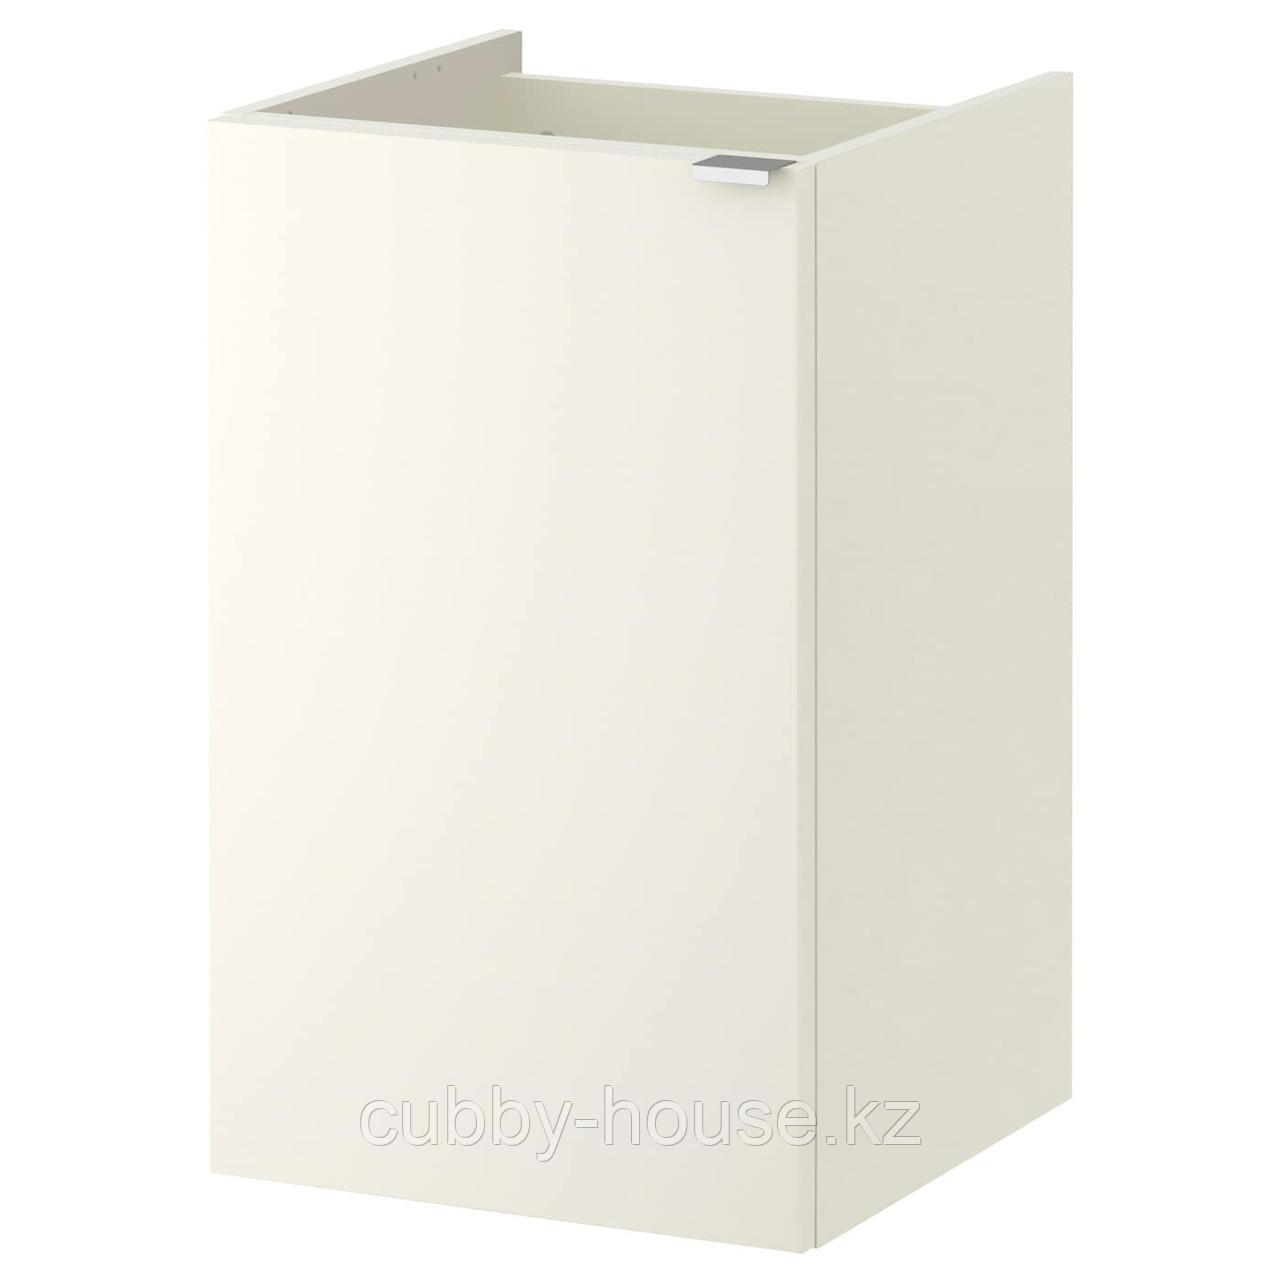 ЛИЛЛОНГЕН Шкаф под раковину с 1 дверцей, белый, 40x38x64 см